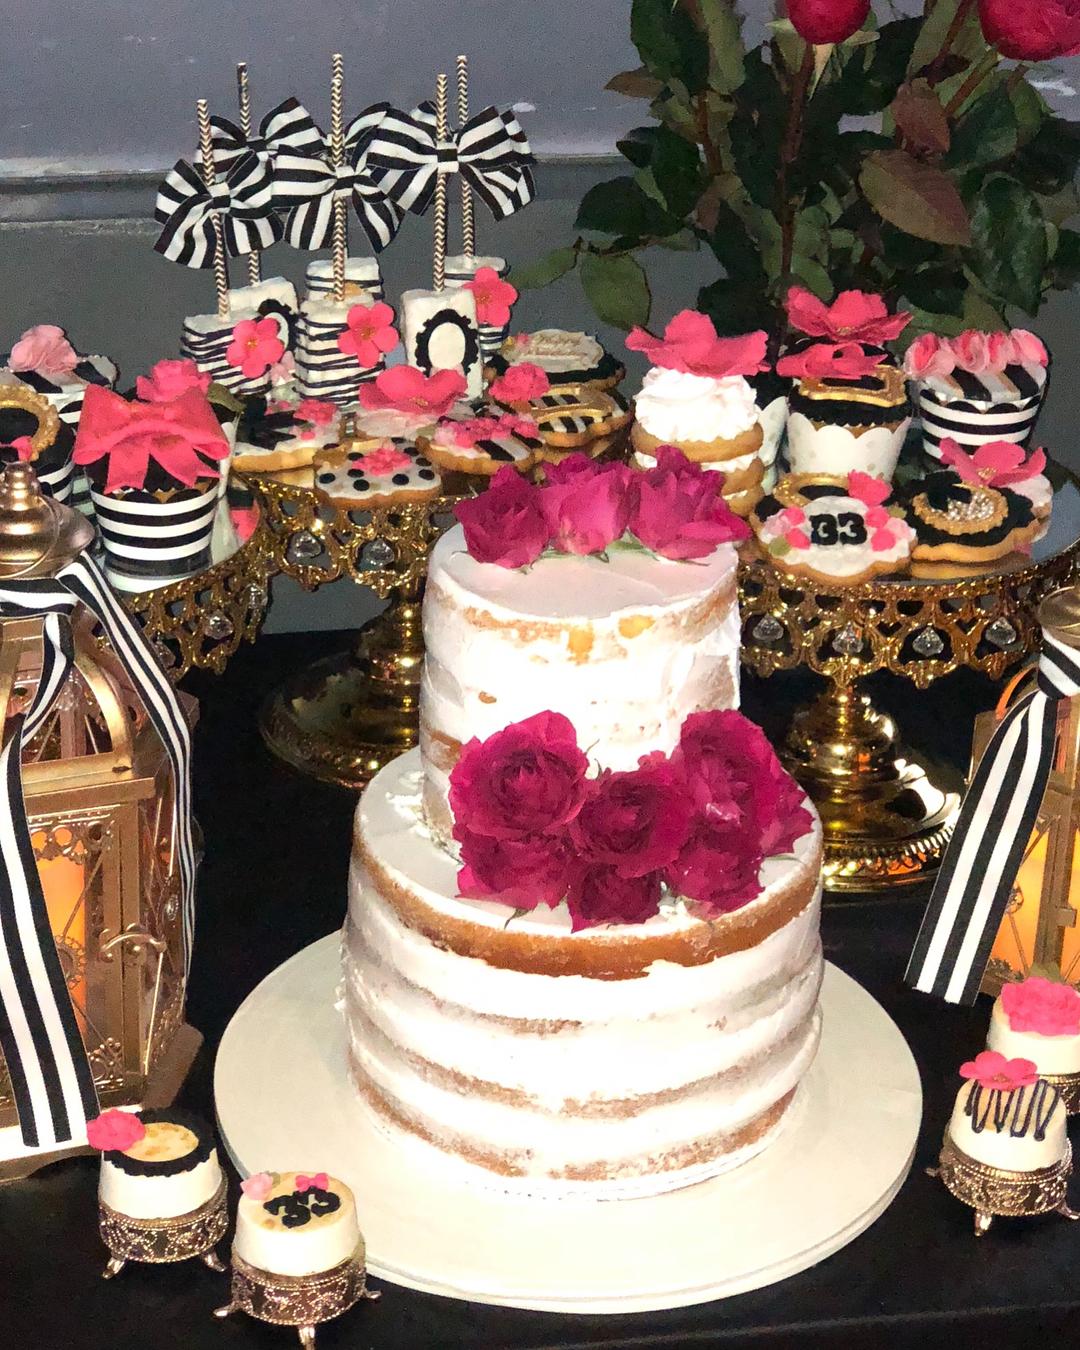 opulent treasures shiny gold cake stands bake lake cupcakes.jpg